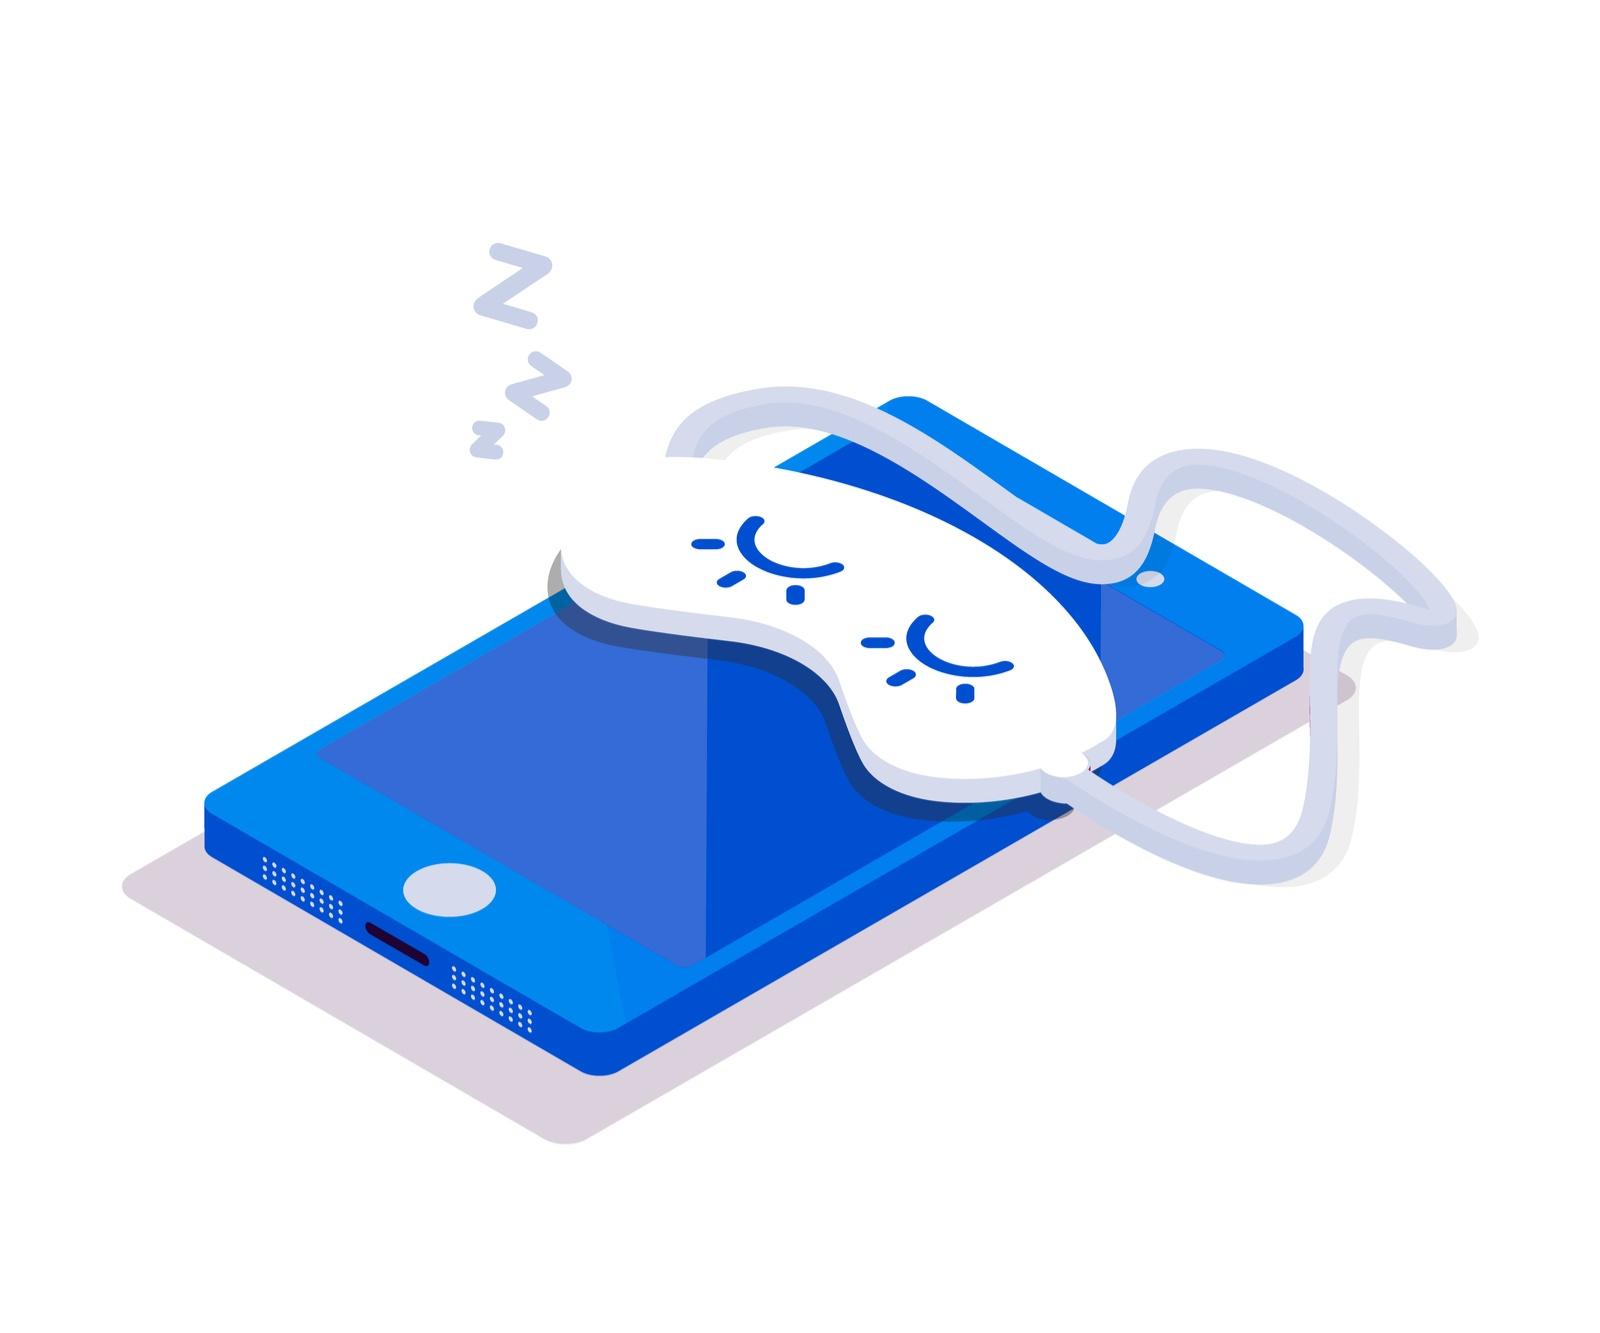 Sleep Apnea and Online Screeners: Pros and Cons